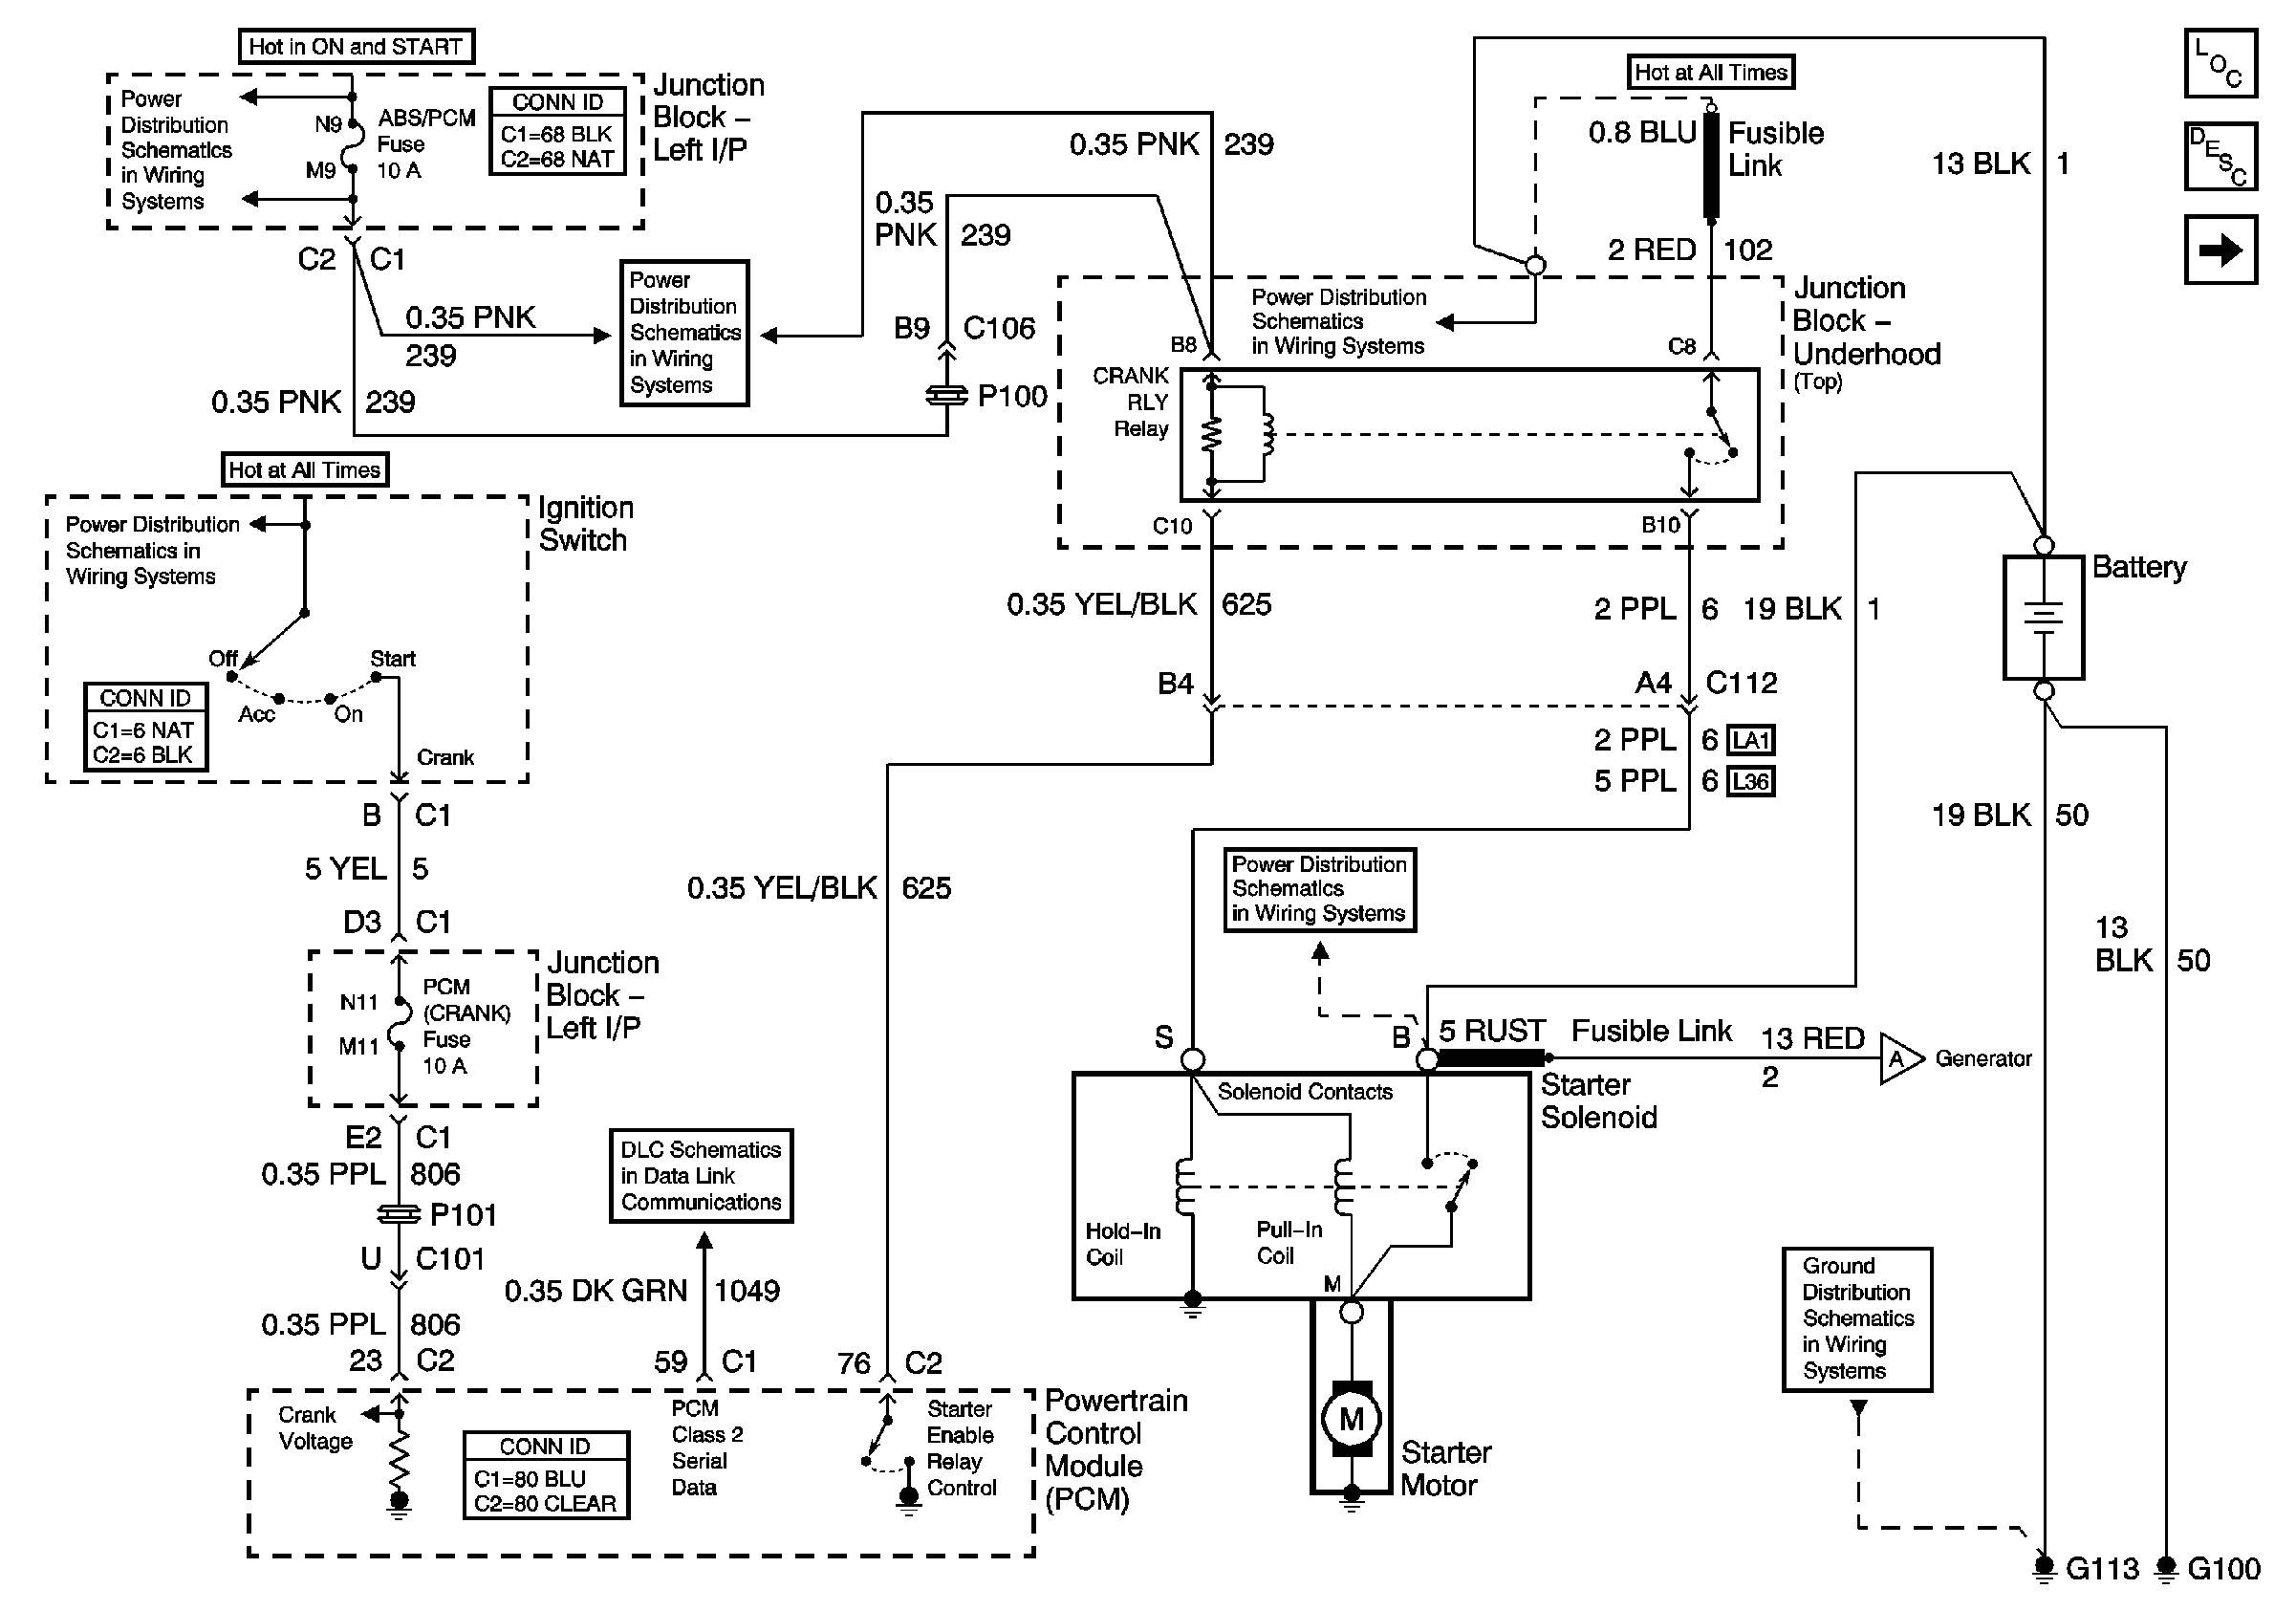 2003 chevy impala headlight dimmer switch wiring diagram wiring